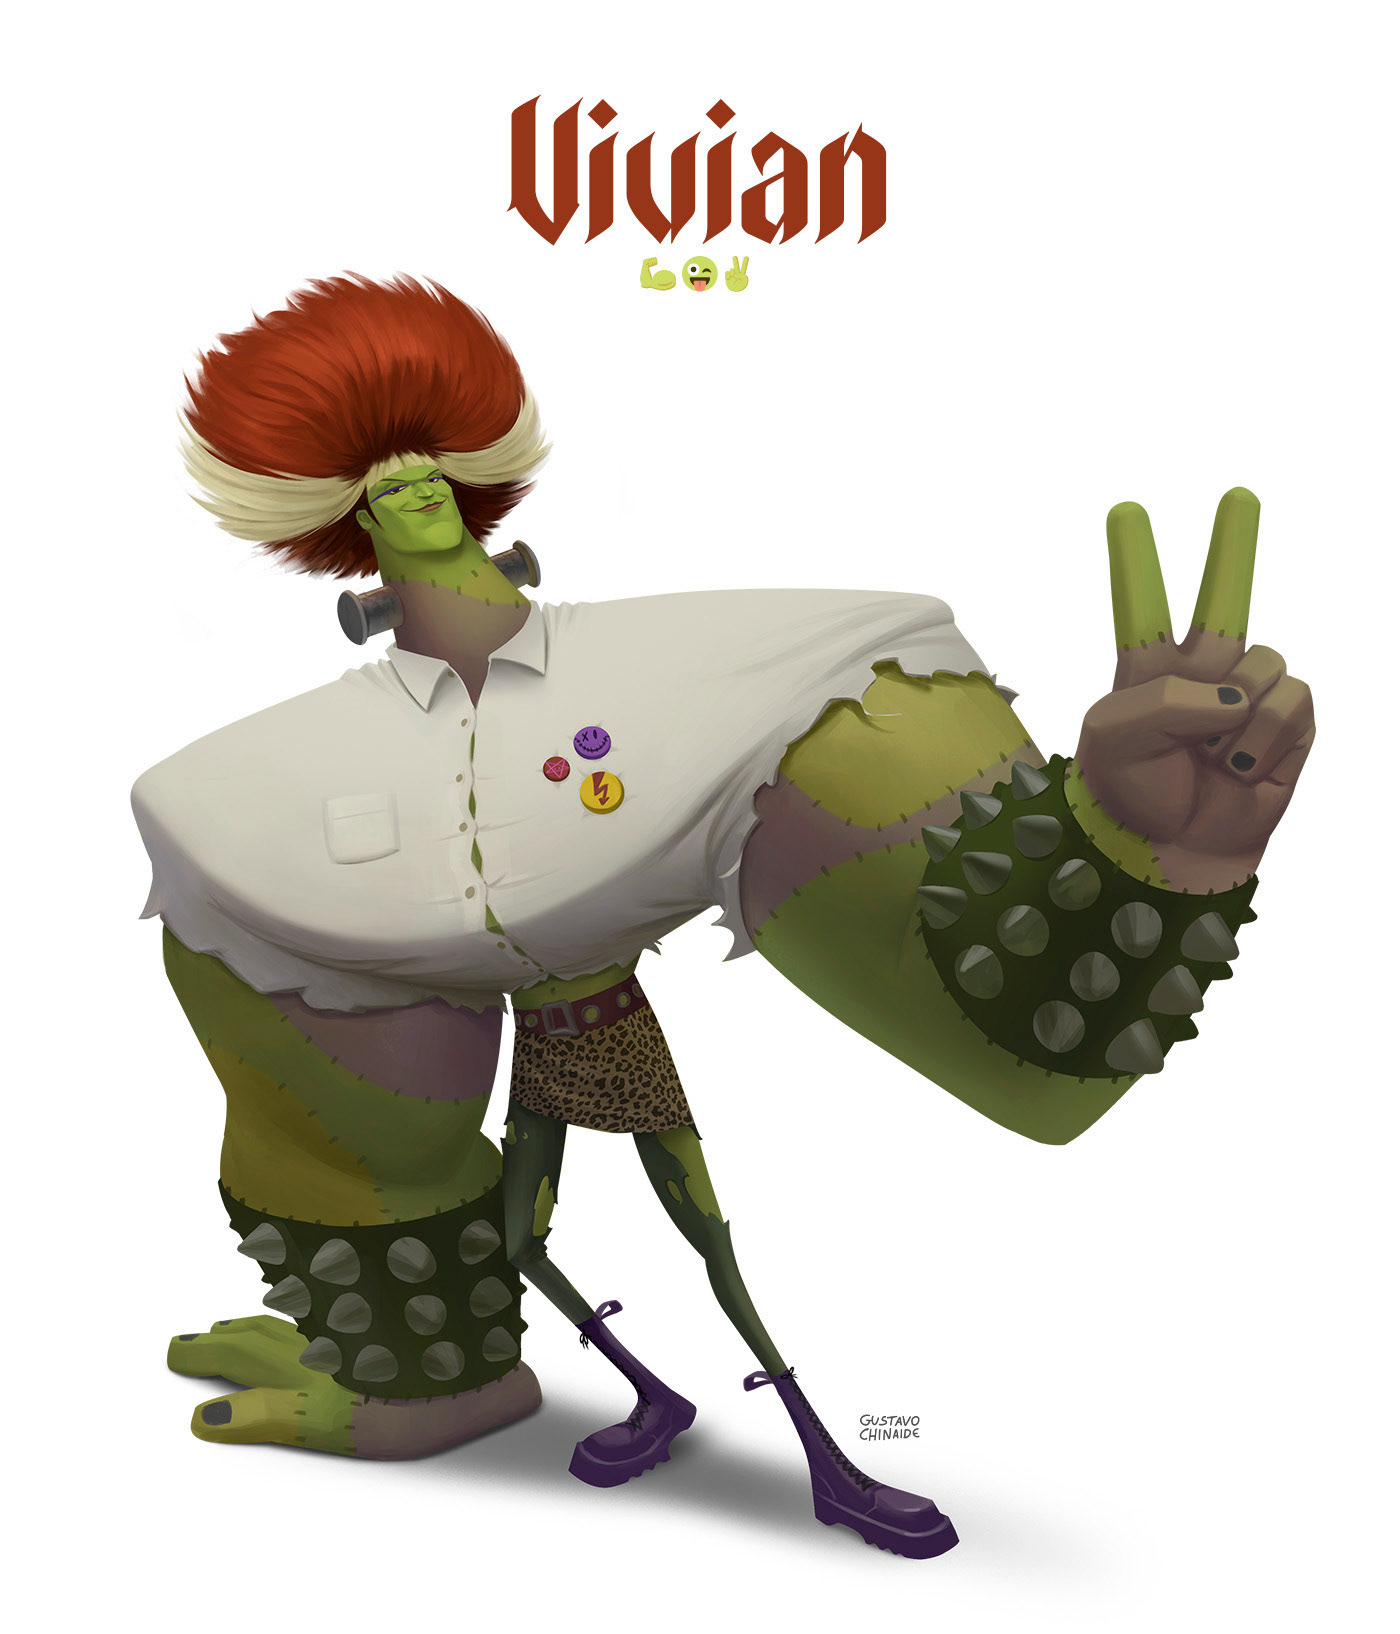 animation  Character Character design  concept frankenstein punk VisDev Visual Development Halloween